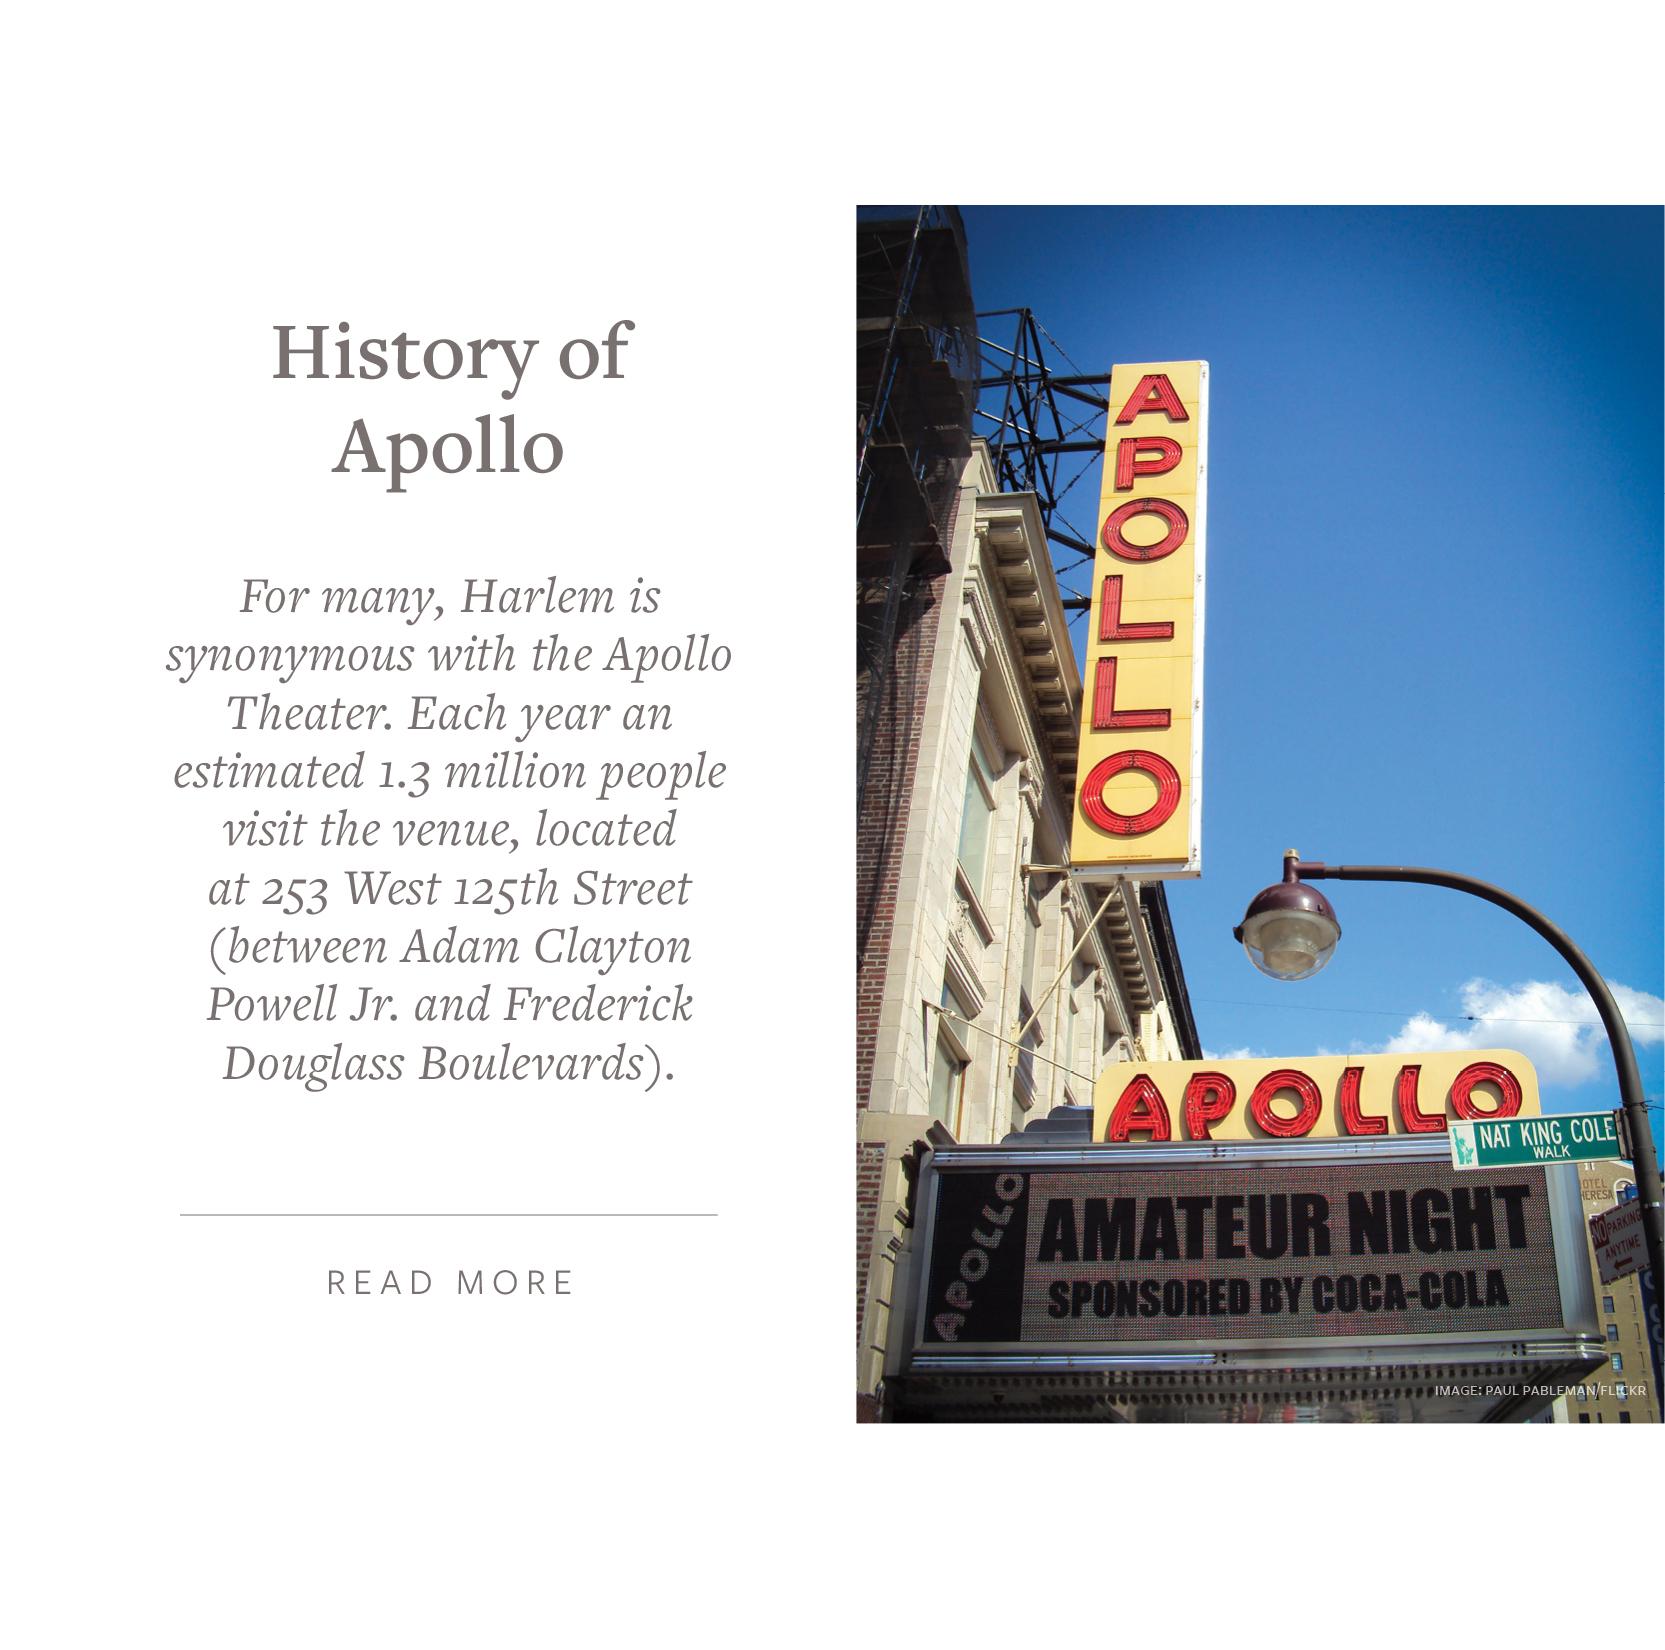 Apollo Theater - 253 West 125th Street